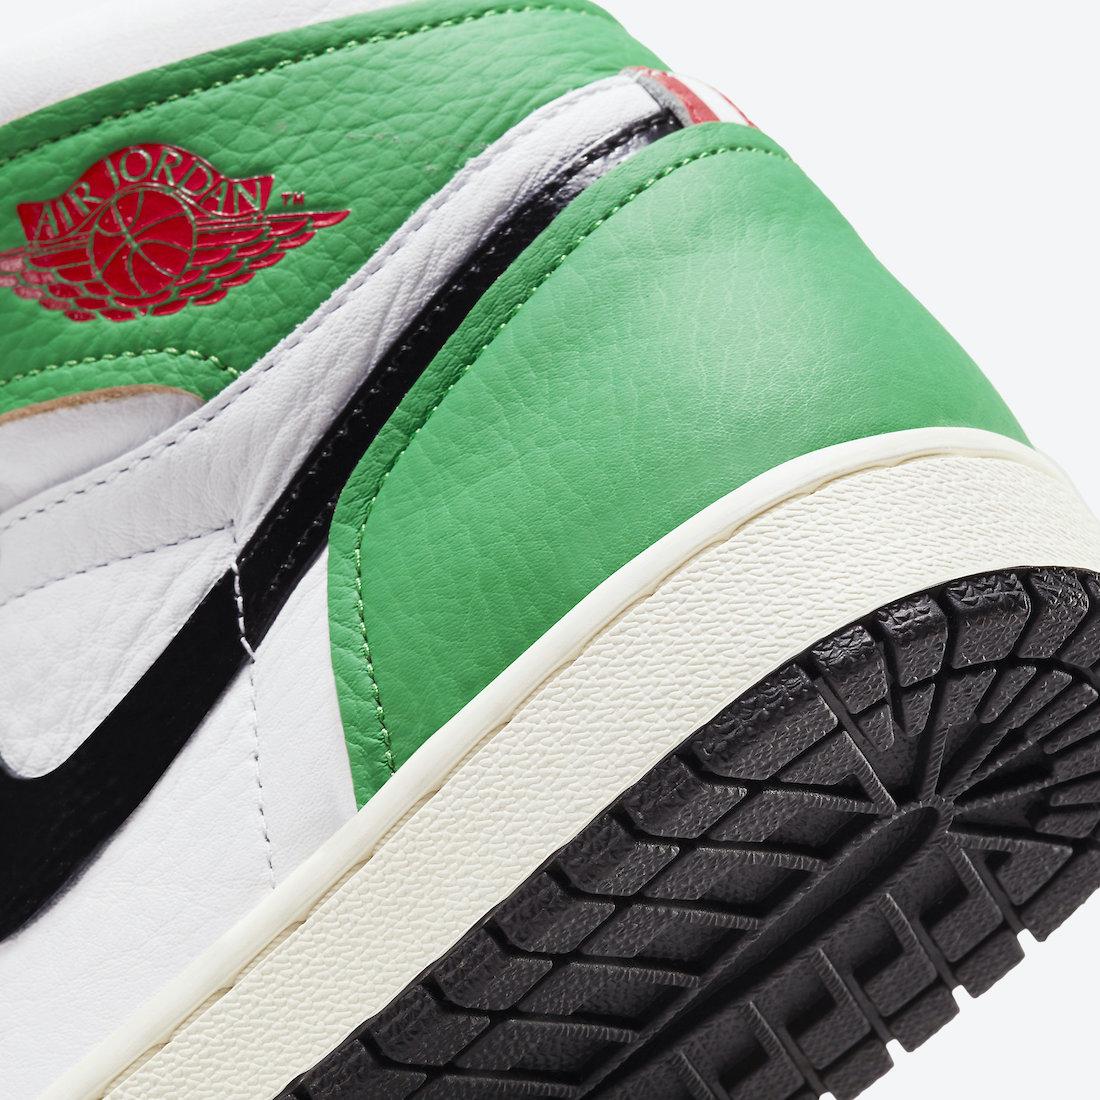 Air-Jordan-1-Lucky-Green-DB4612-300-Release-Date-Price-7